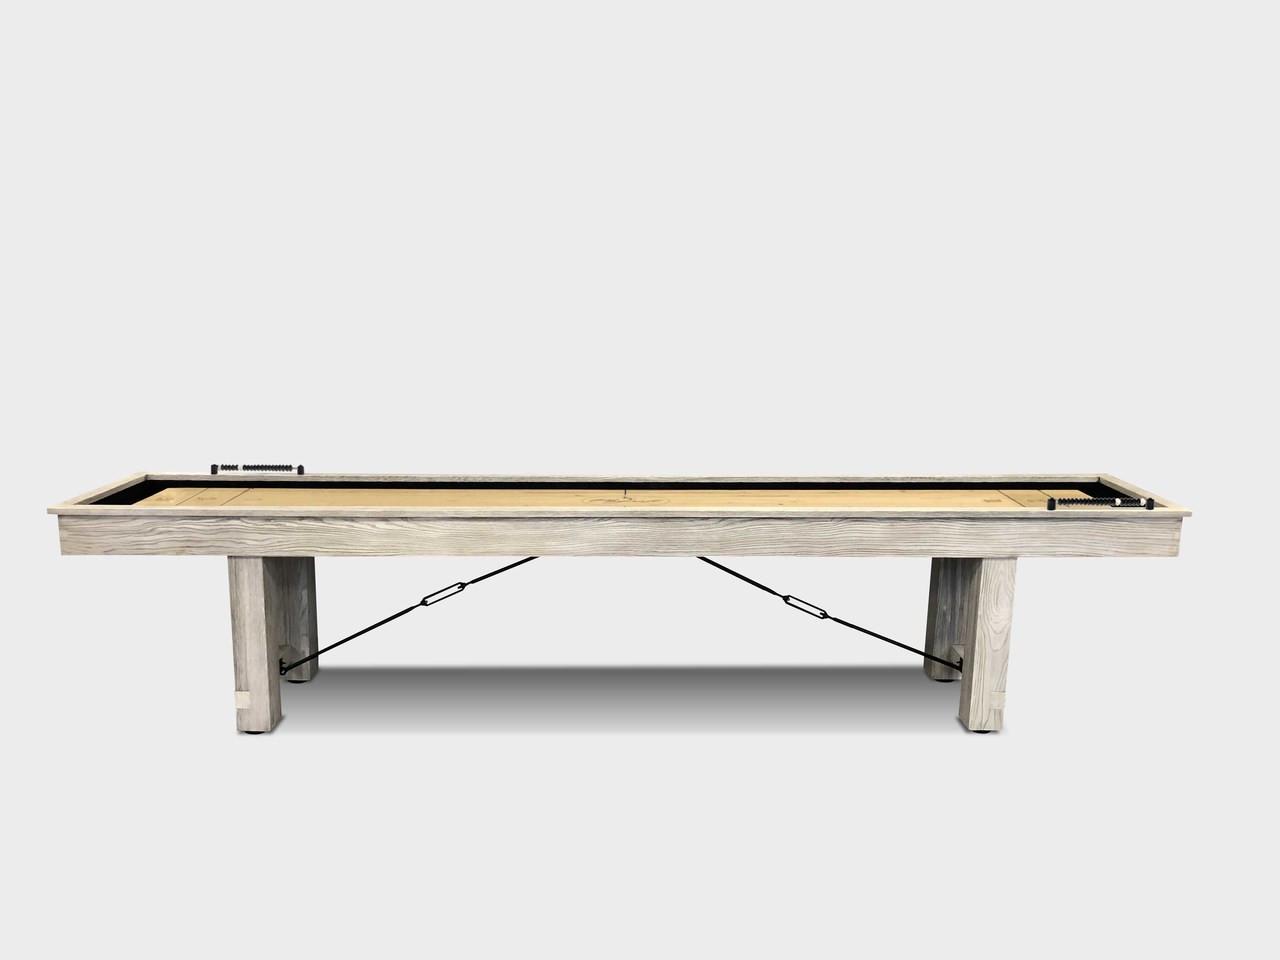 Playcraft Montauk Shuffleboard Table